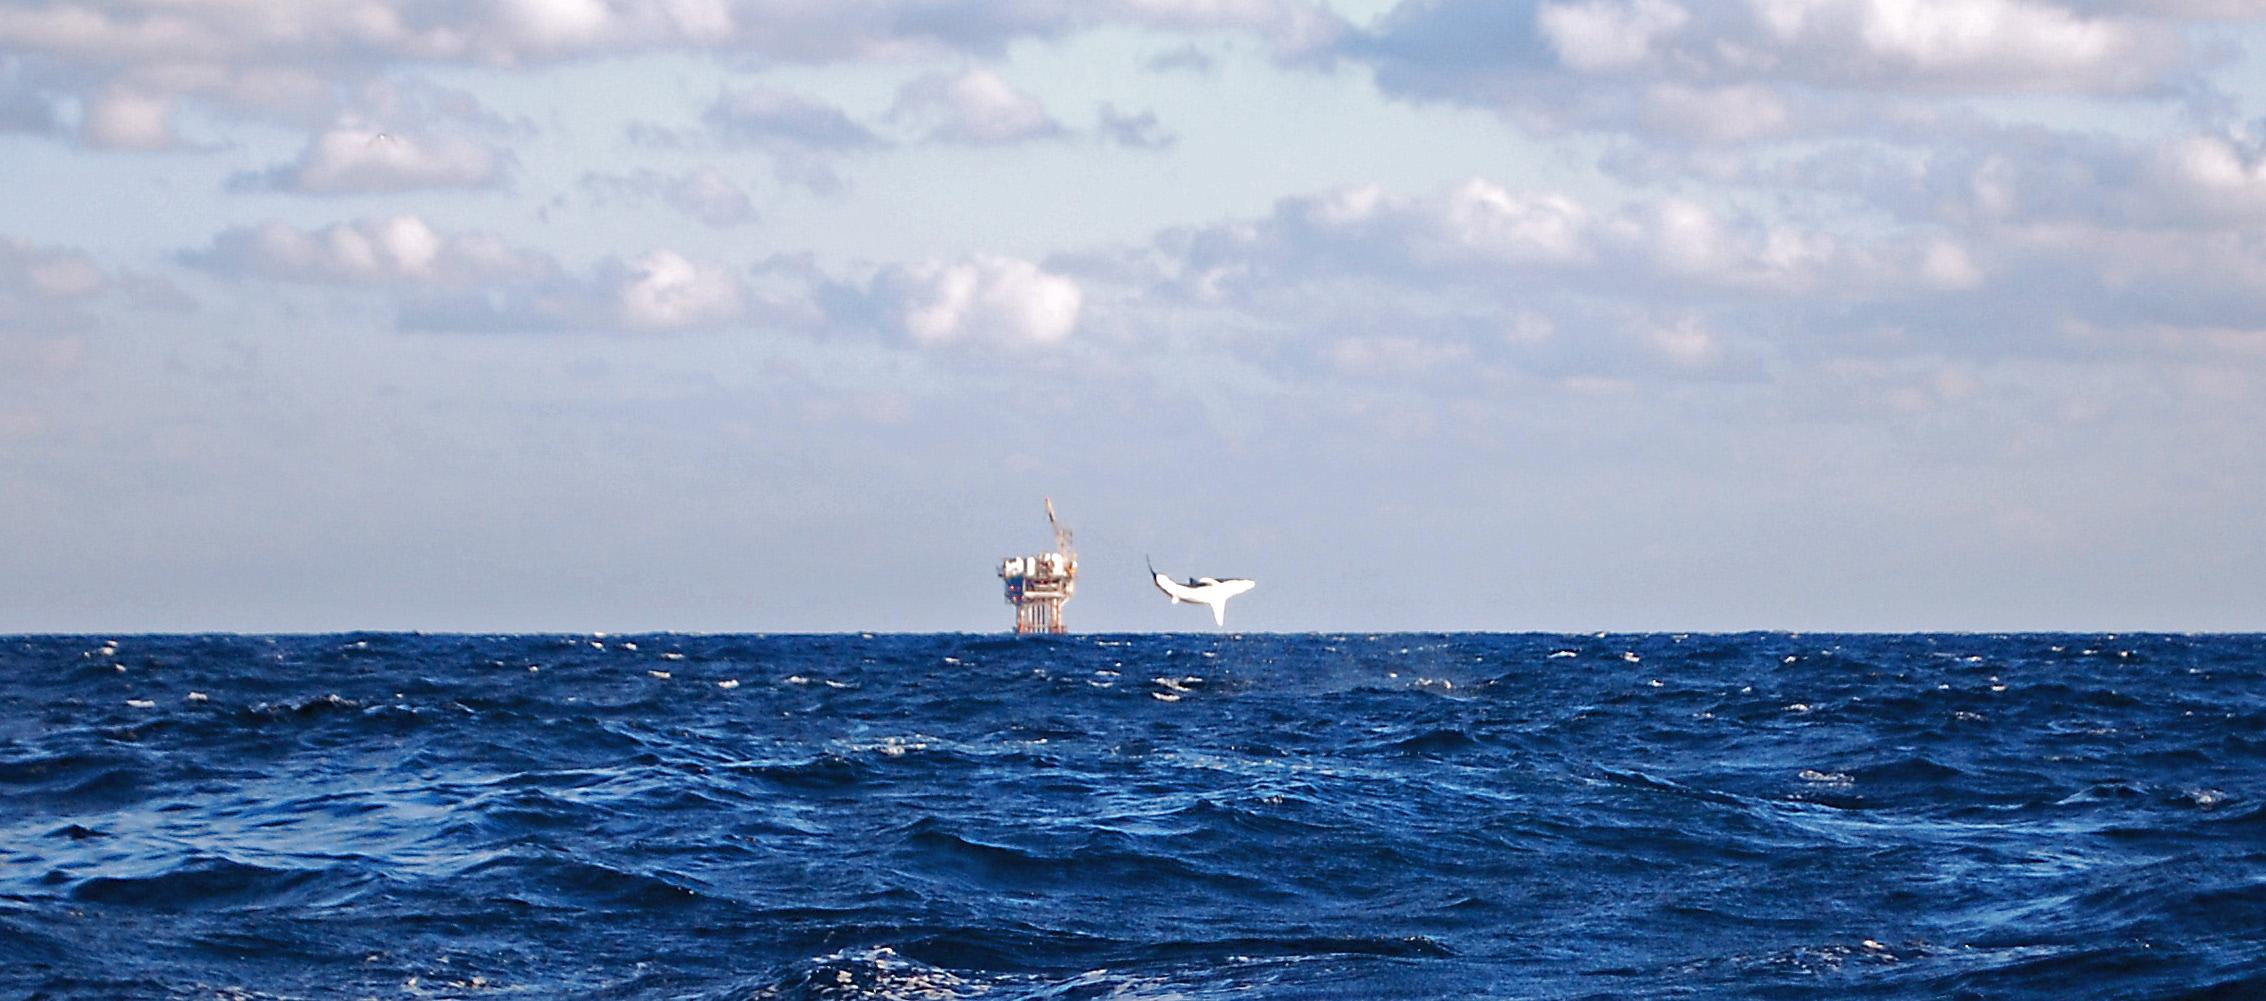 Offshore Venice-Pelagic update.-dsc_0553_edited-jpg